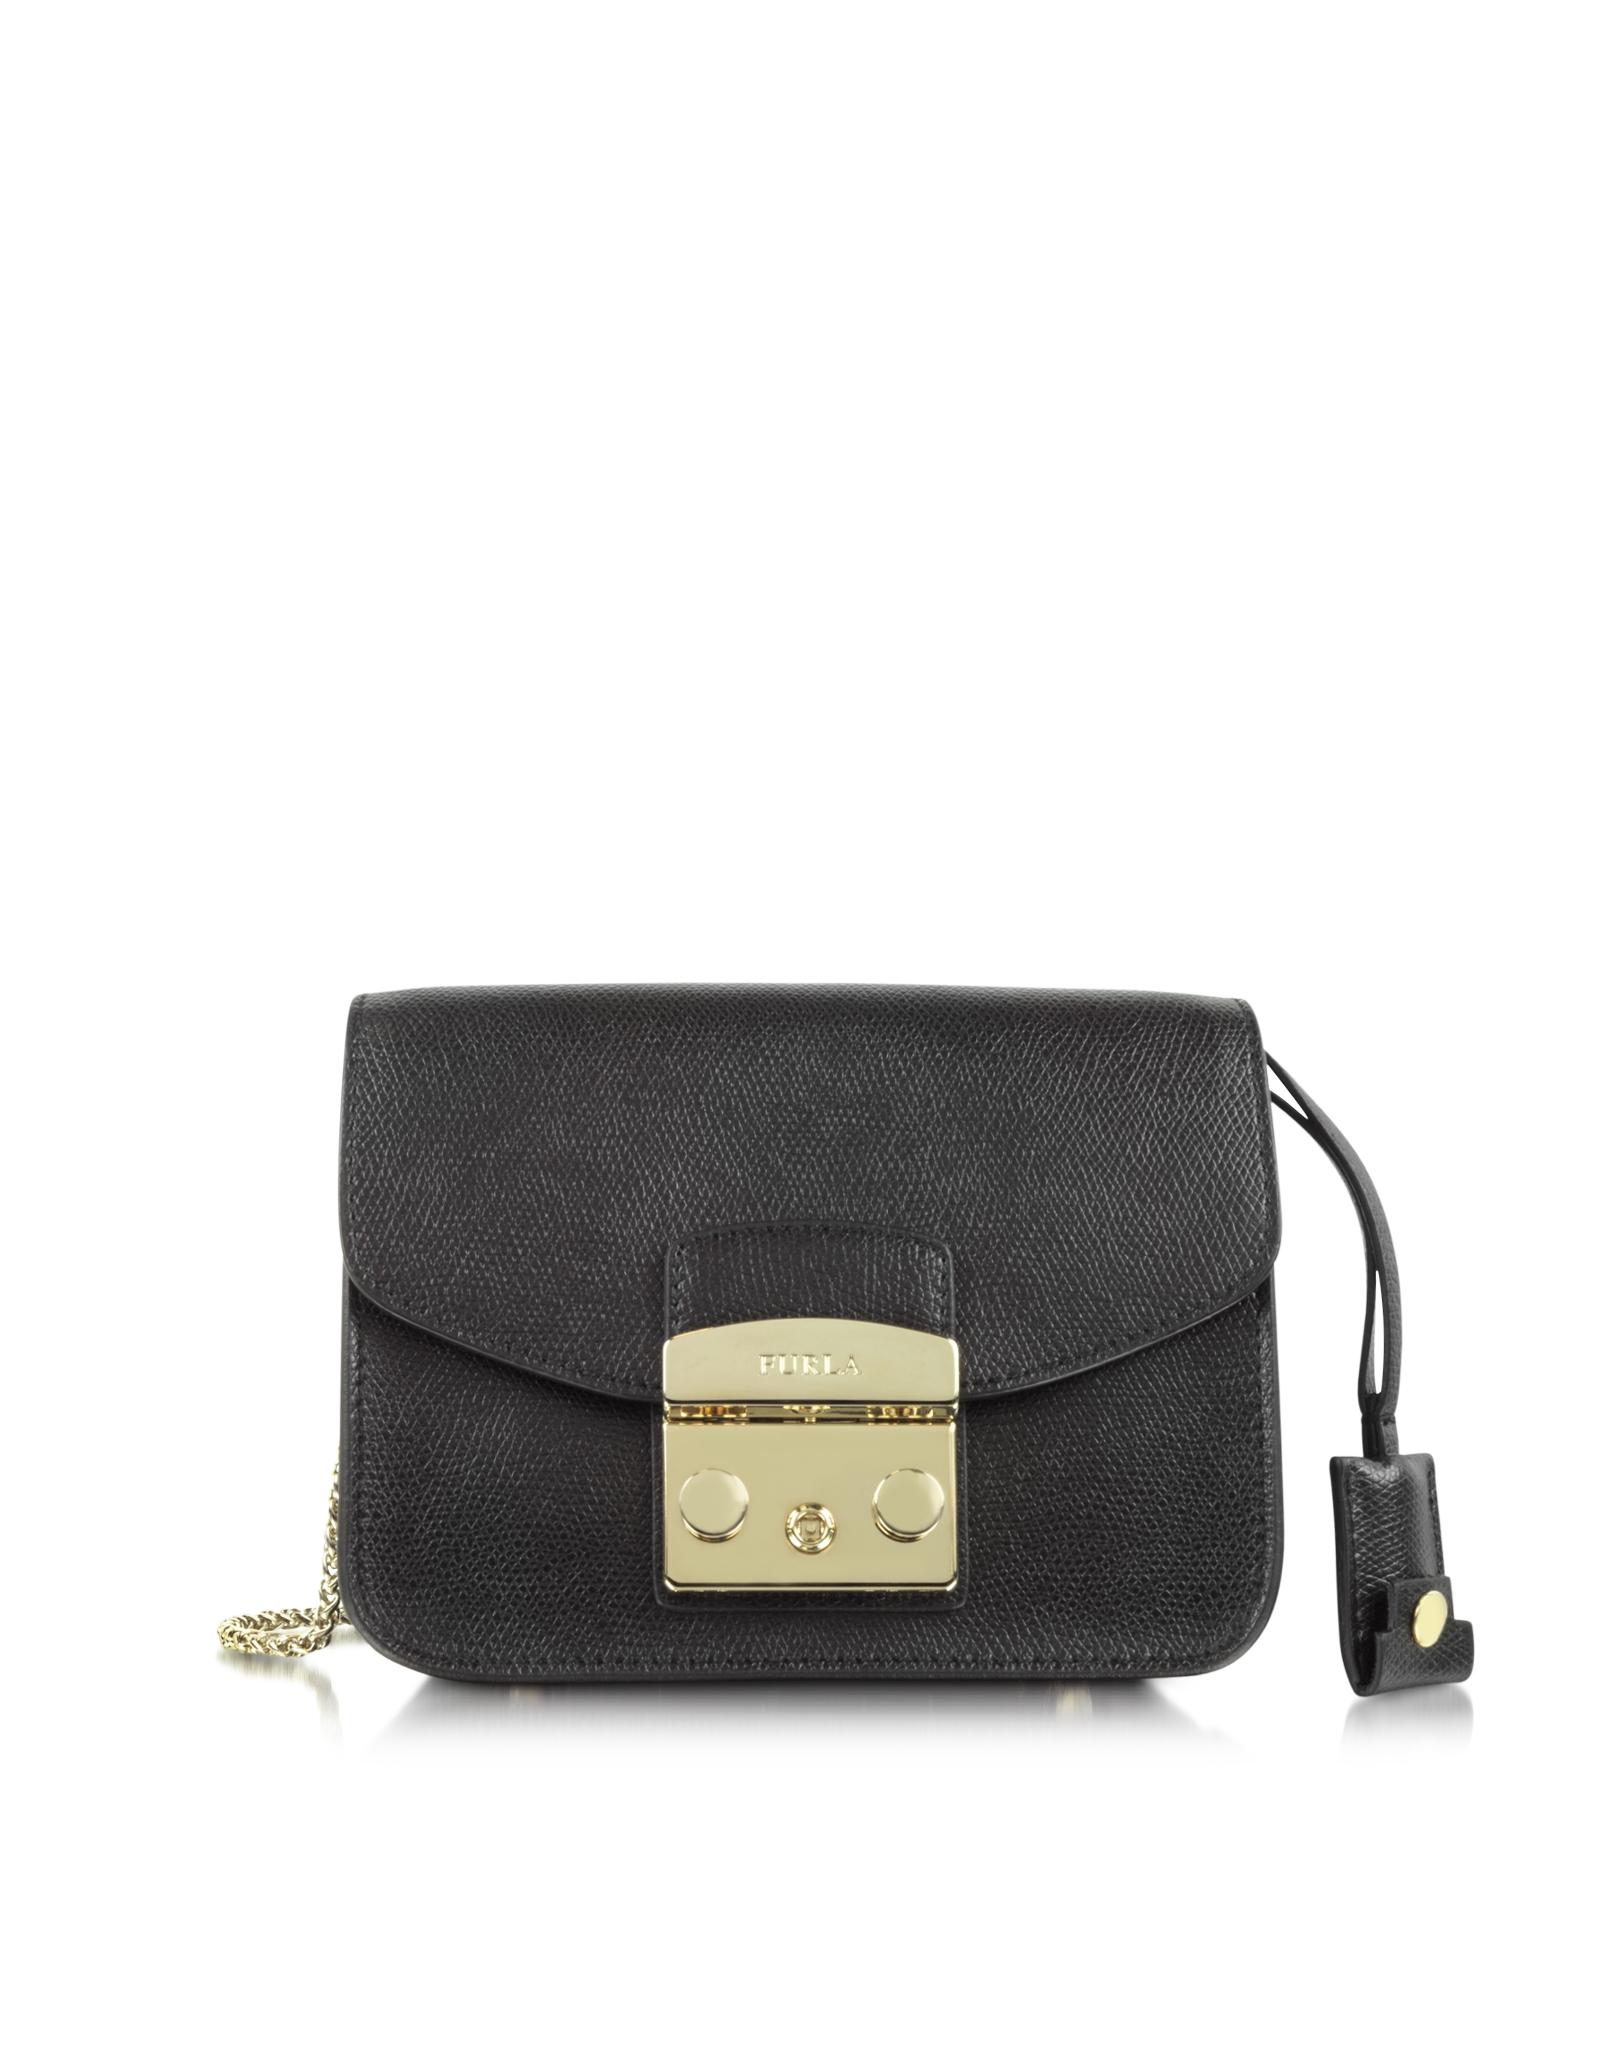 furla metropolis mini crossbody bag in black onyx lyst. Black Bedroom Furniture Sets. Home Design Ideas